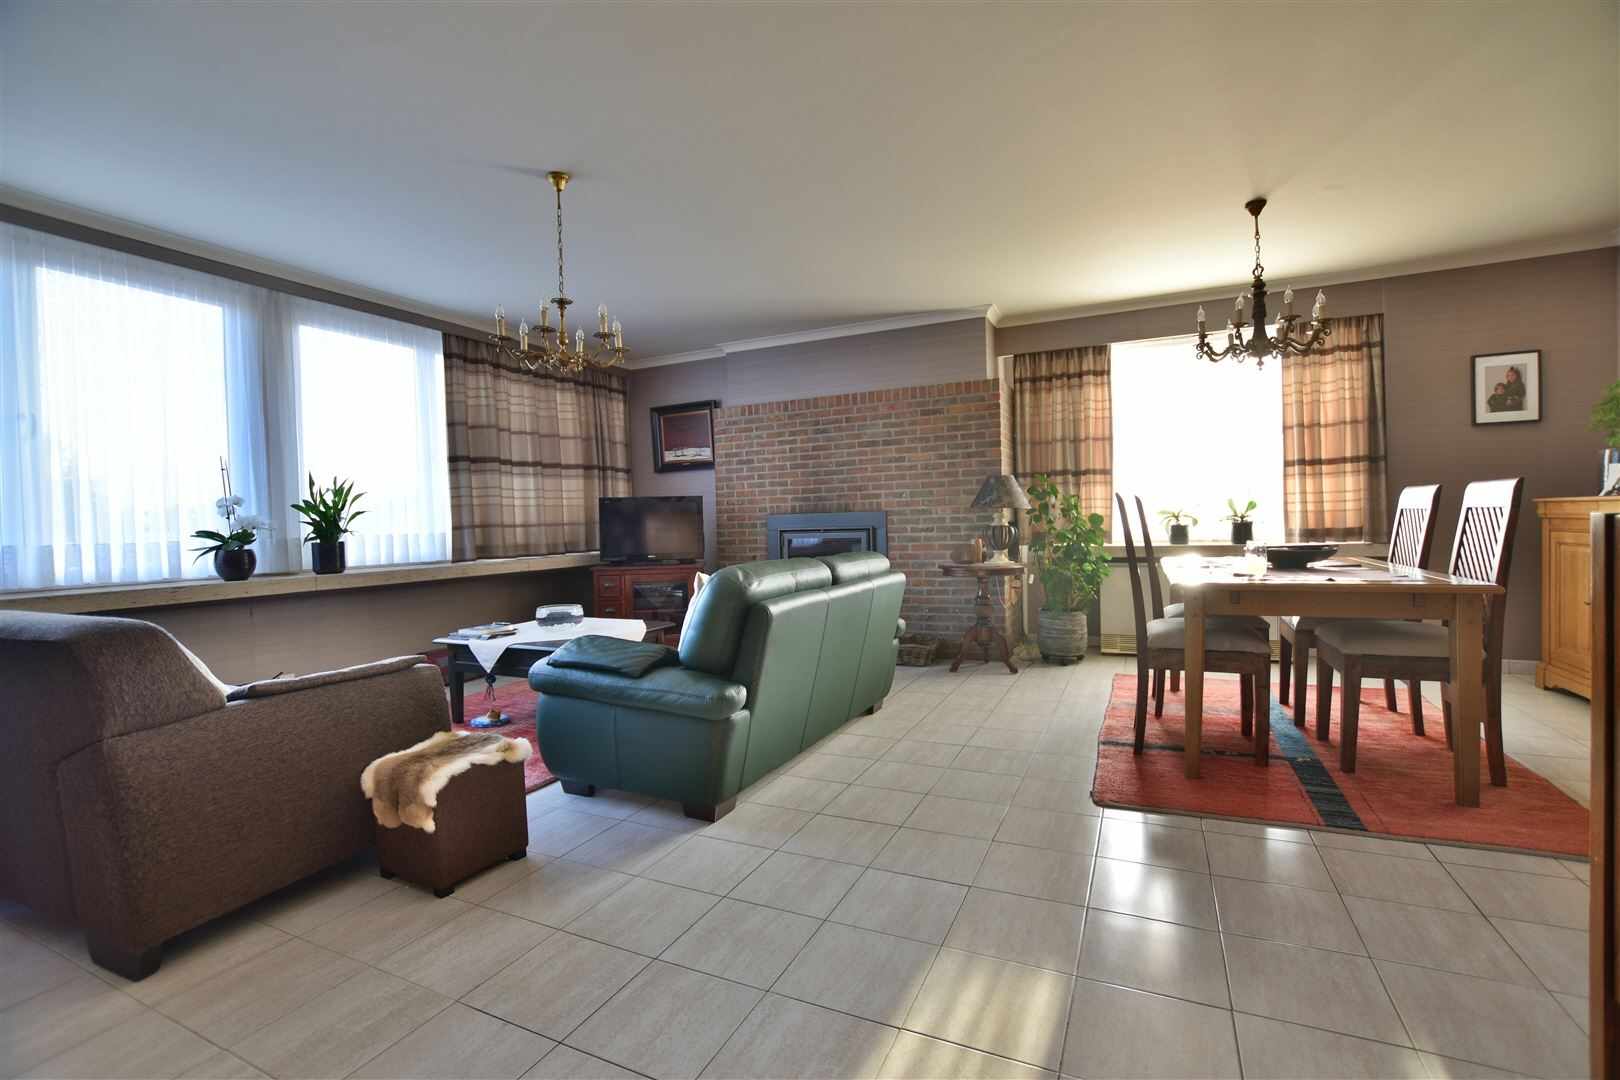 Foto 1 : Appartement te 9140 TEMSE (België) - Prijs € 299.000